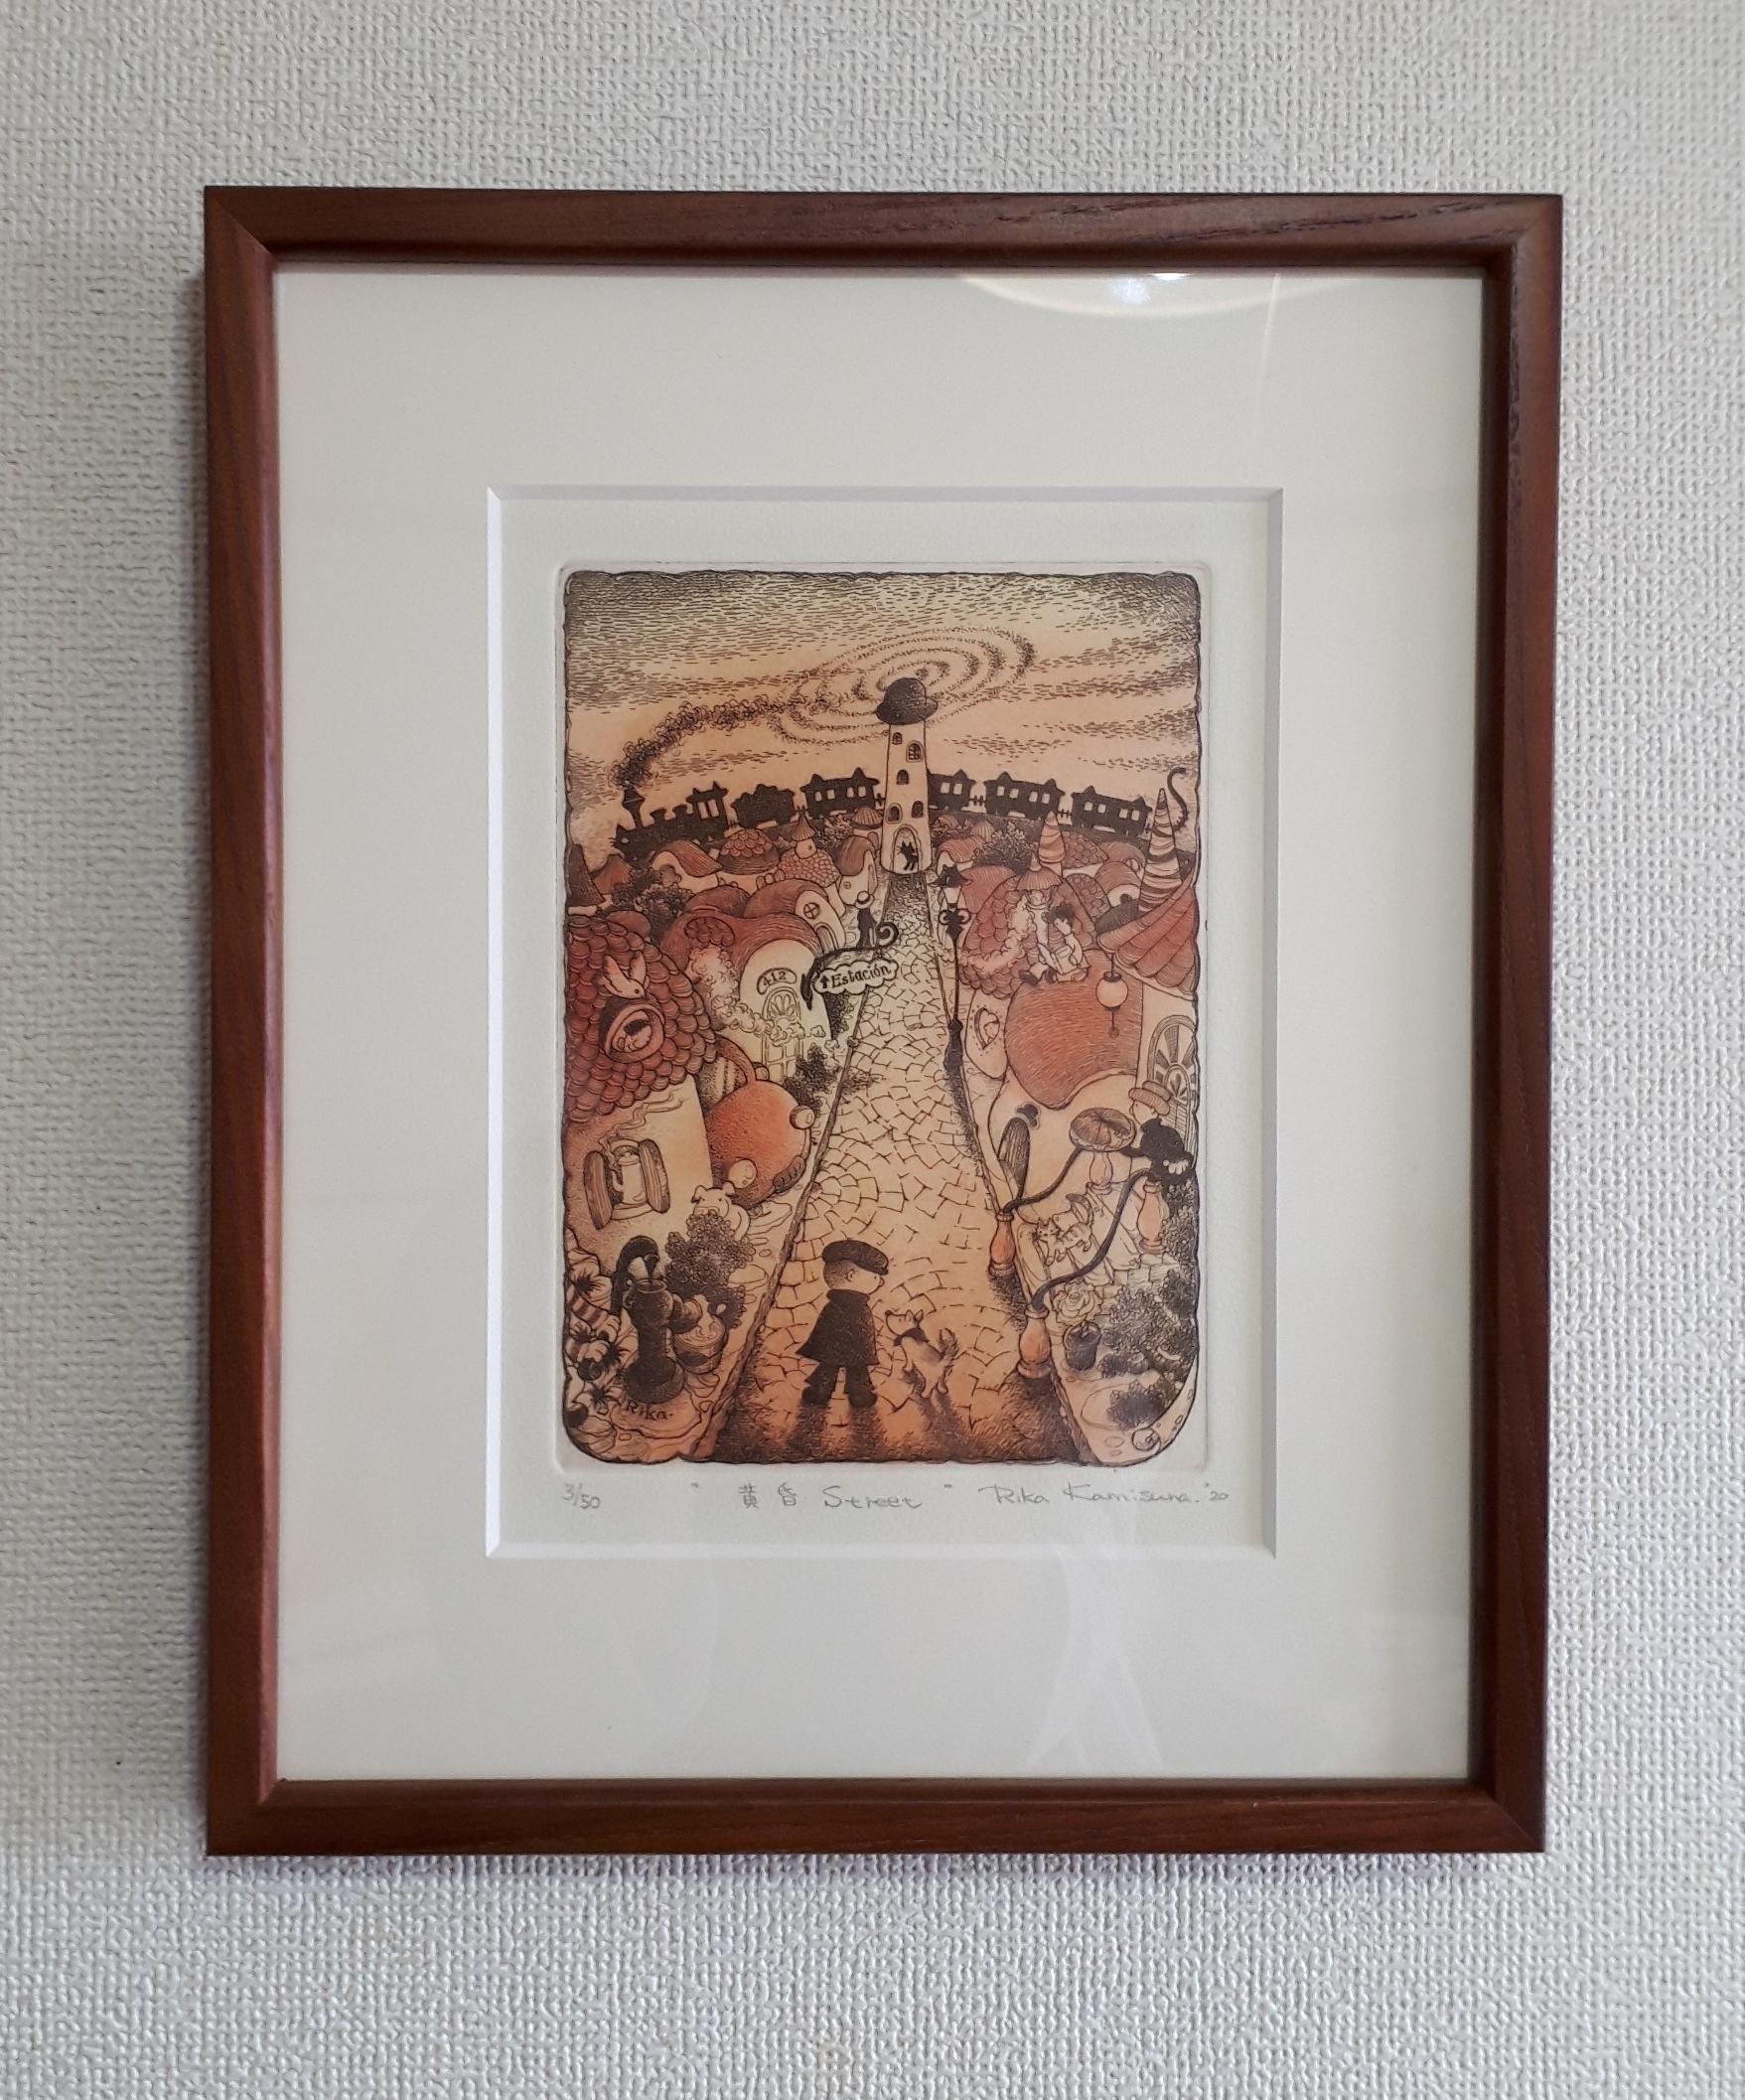 黄昏Street 銅版画額付/L型オーク 八ツ